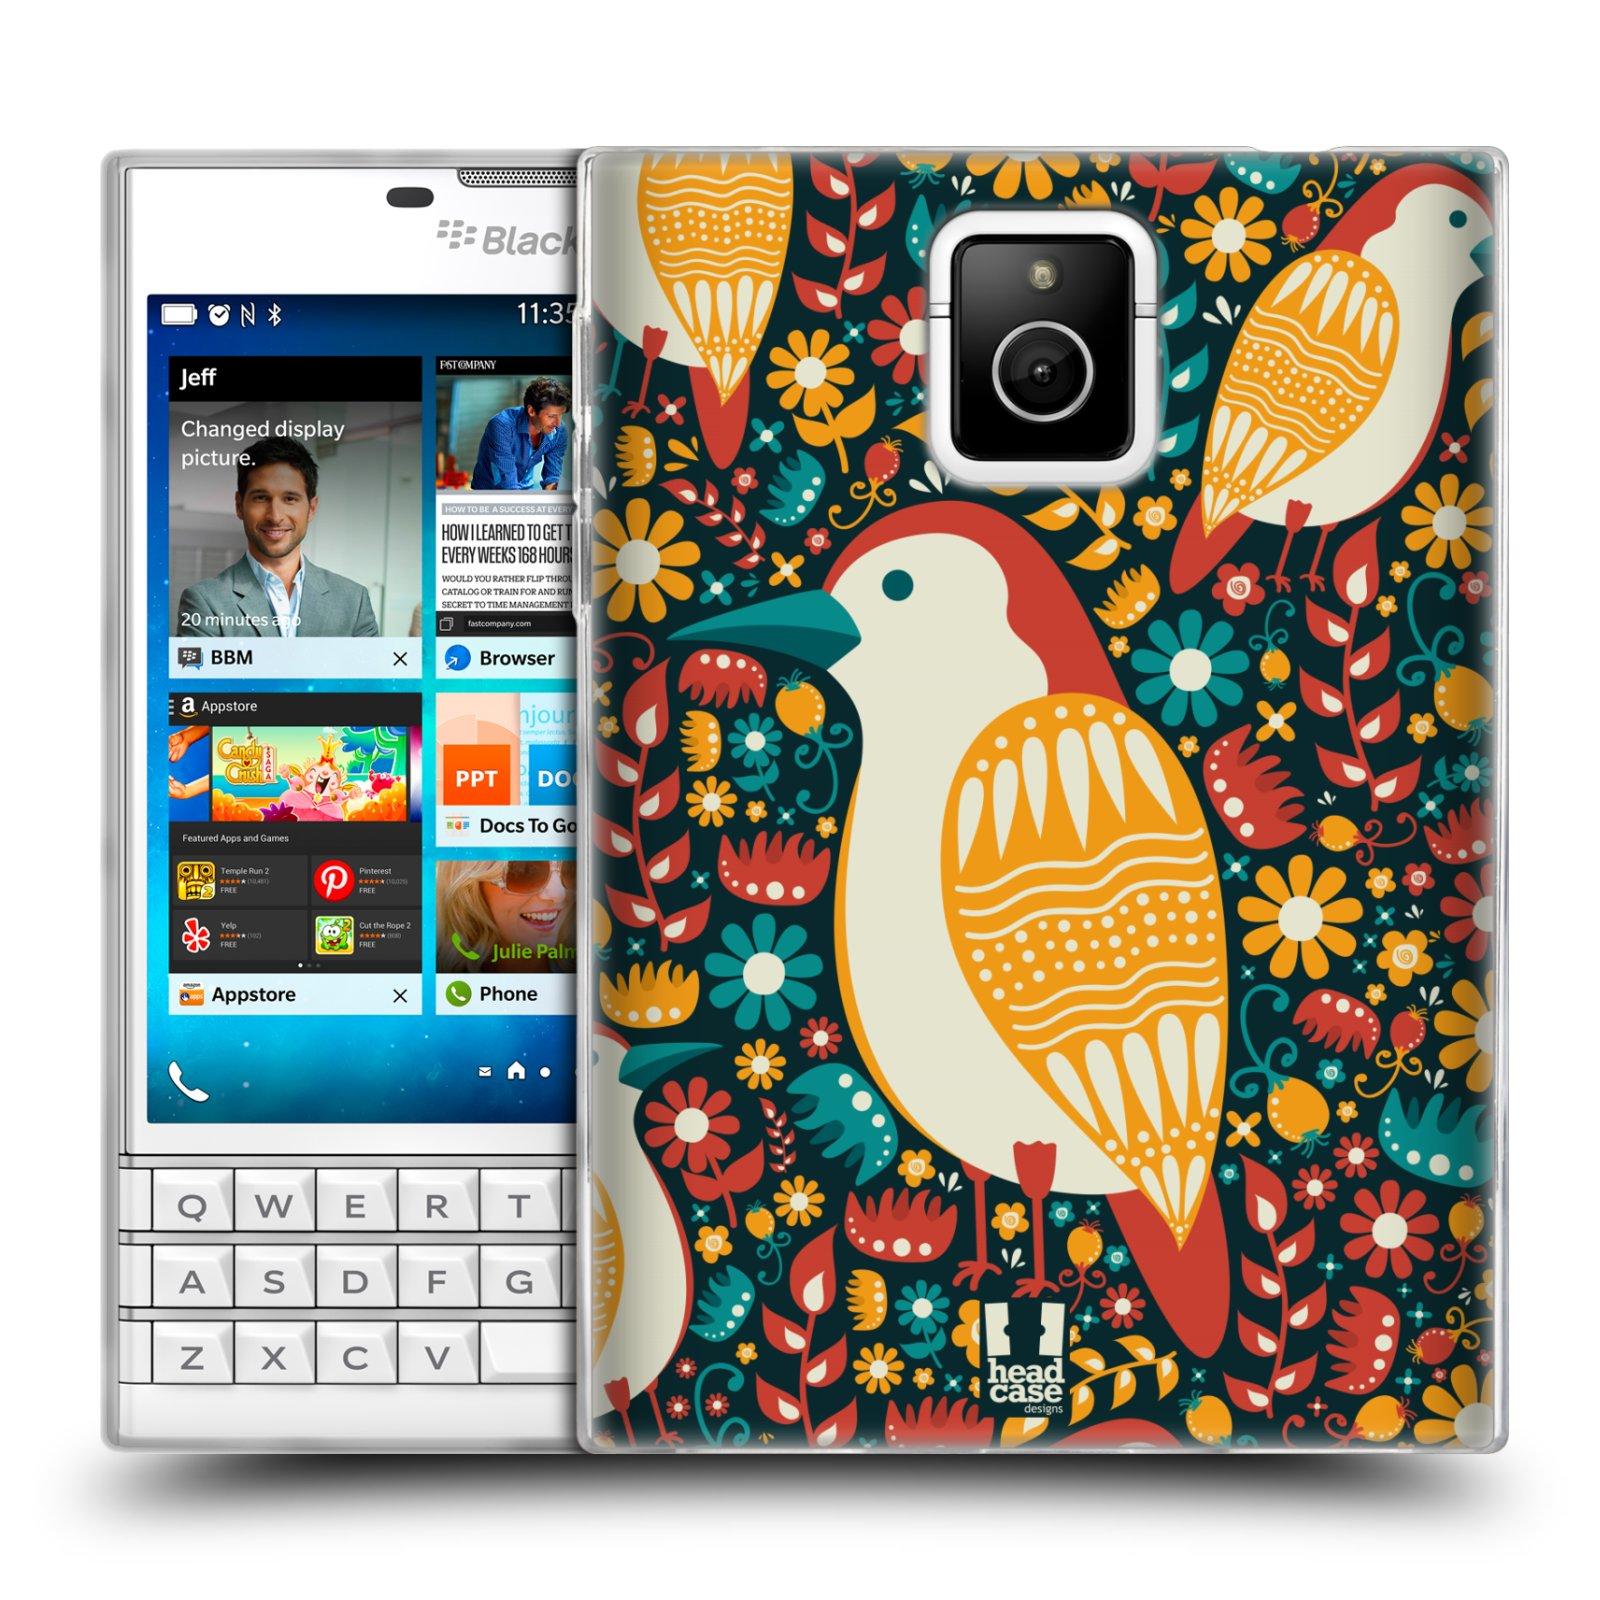 HEAD CASE silikonový obal na mobil Blackberry PASSPORT vzor kreslení ptáci datel